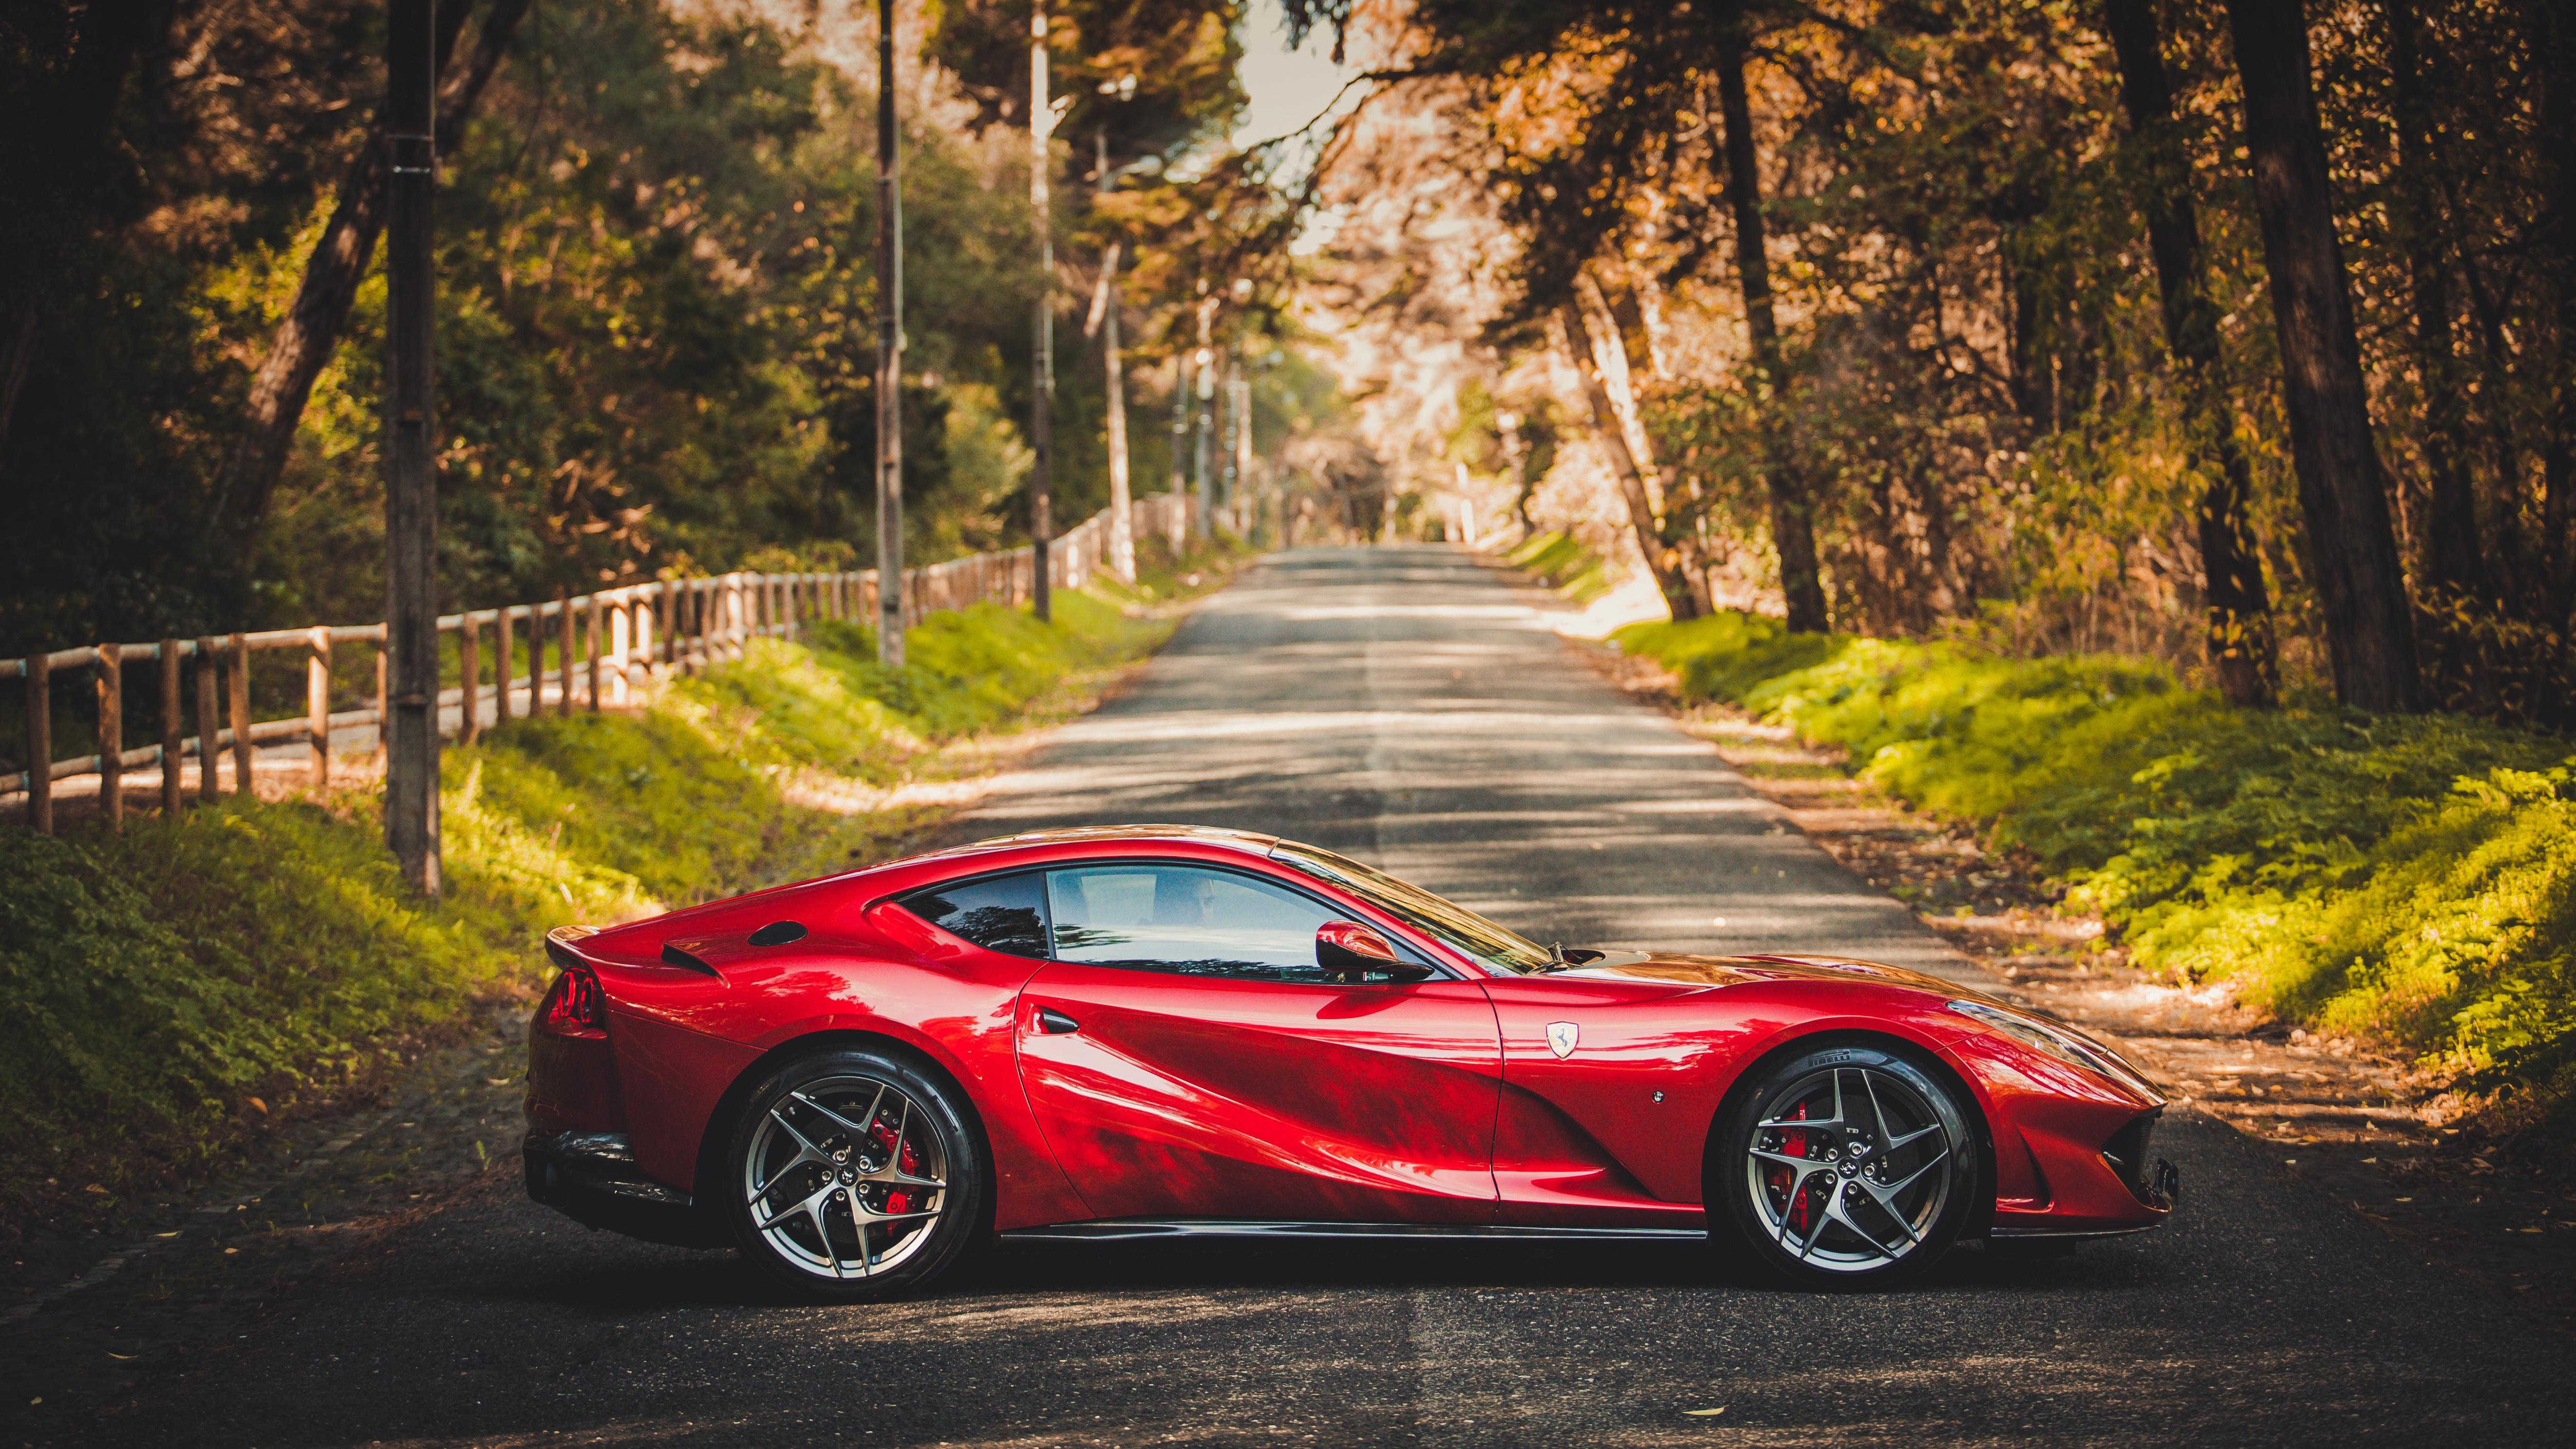 View Ferrari Images Wallpaper  Images